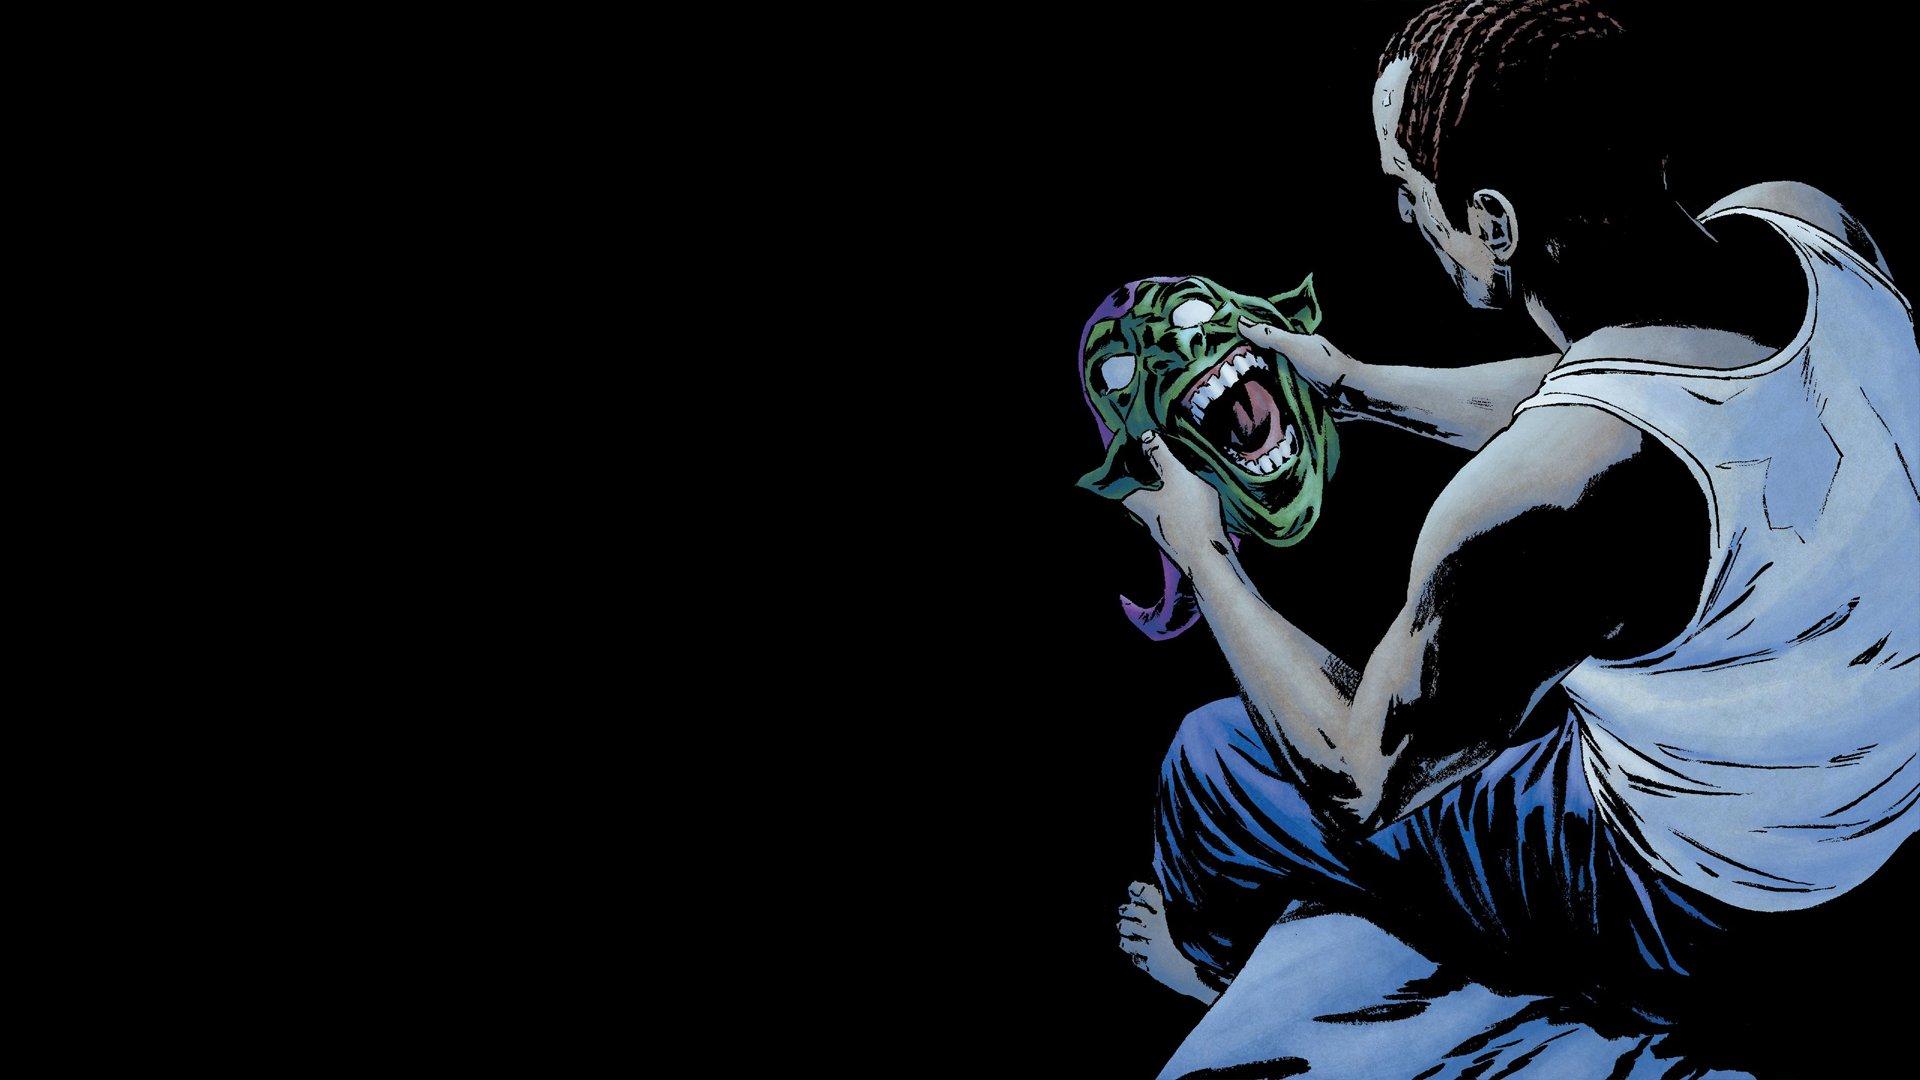 Green goblin hd wallpaper background image 1920x1080 - Hobgoblin wallpaper ...